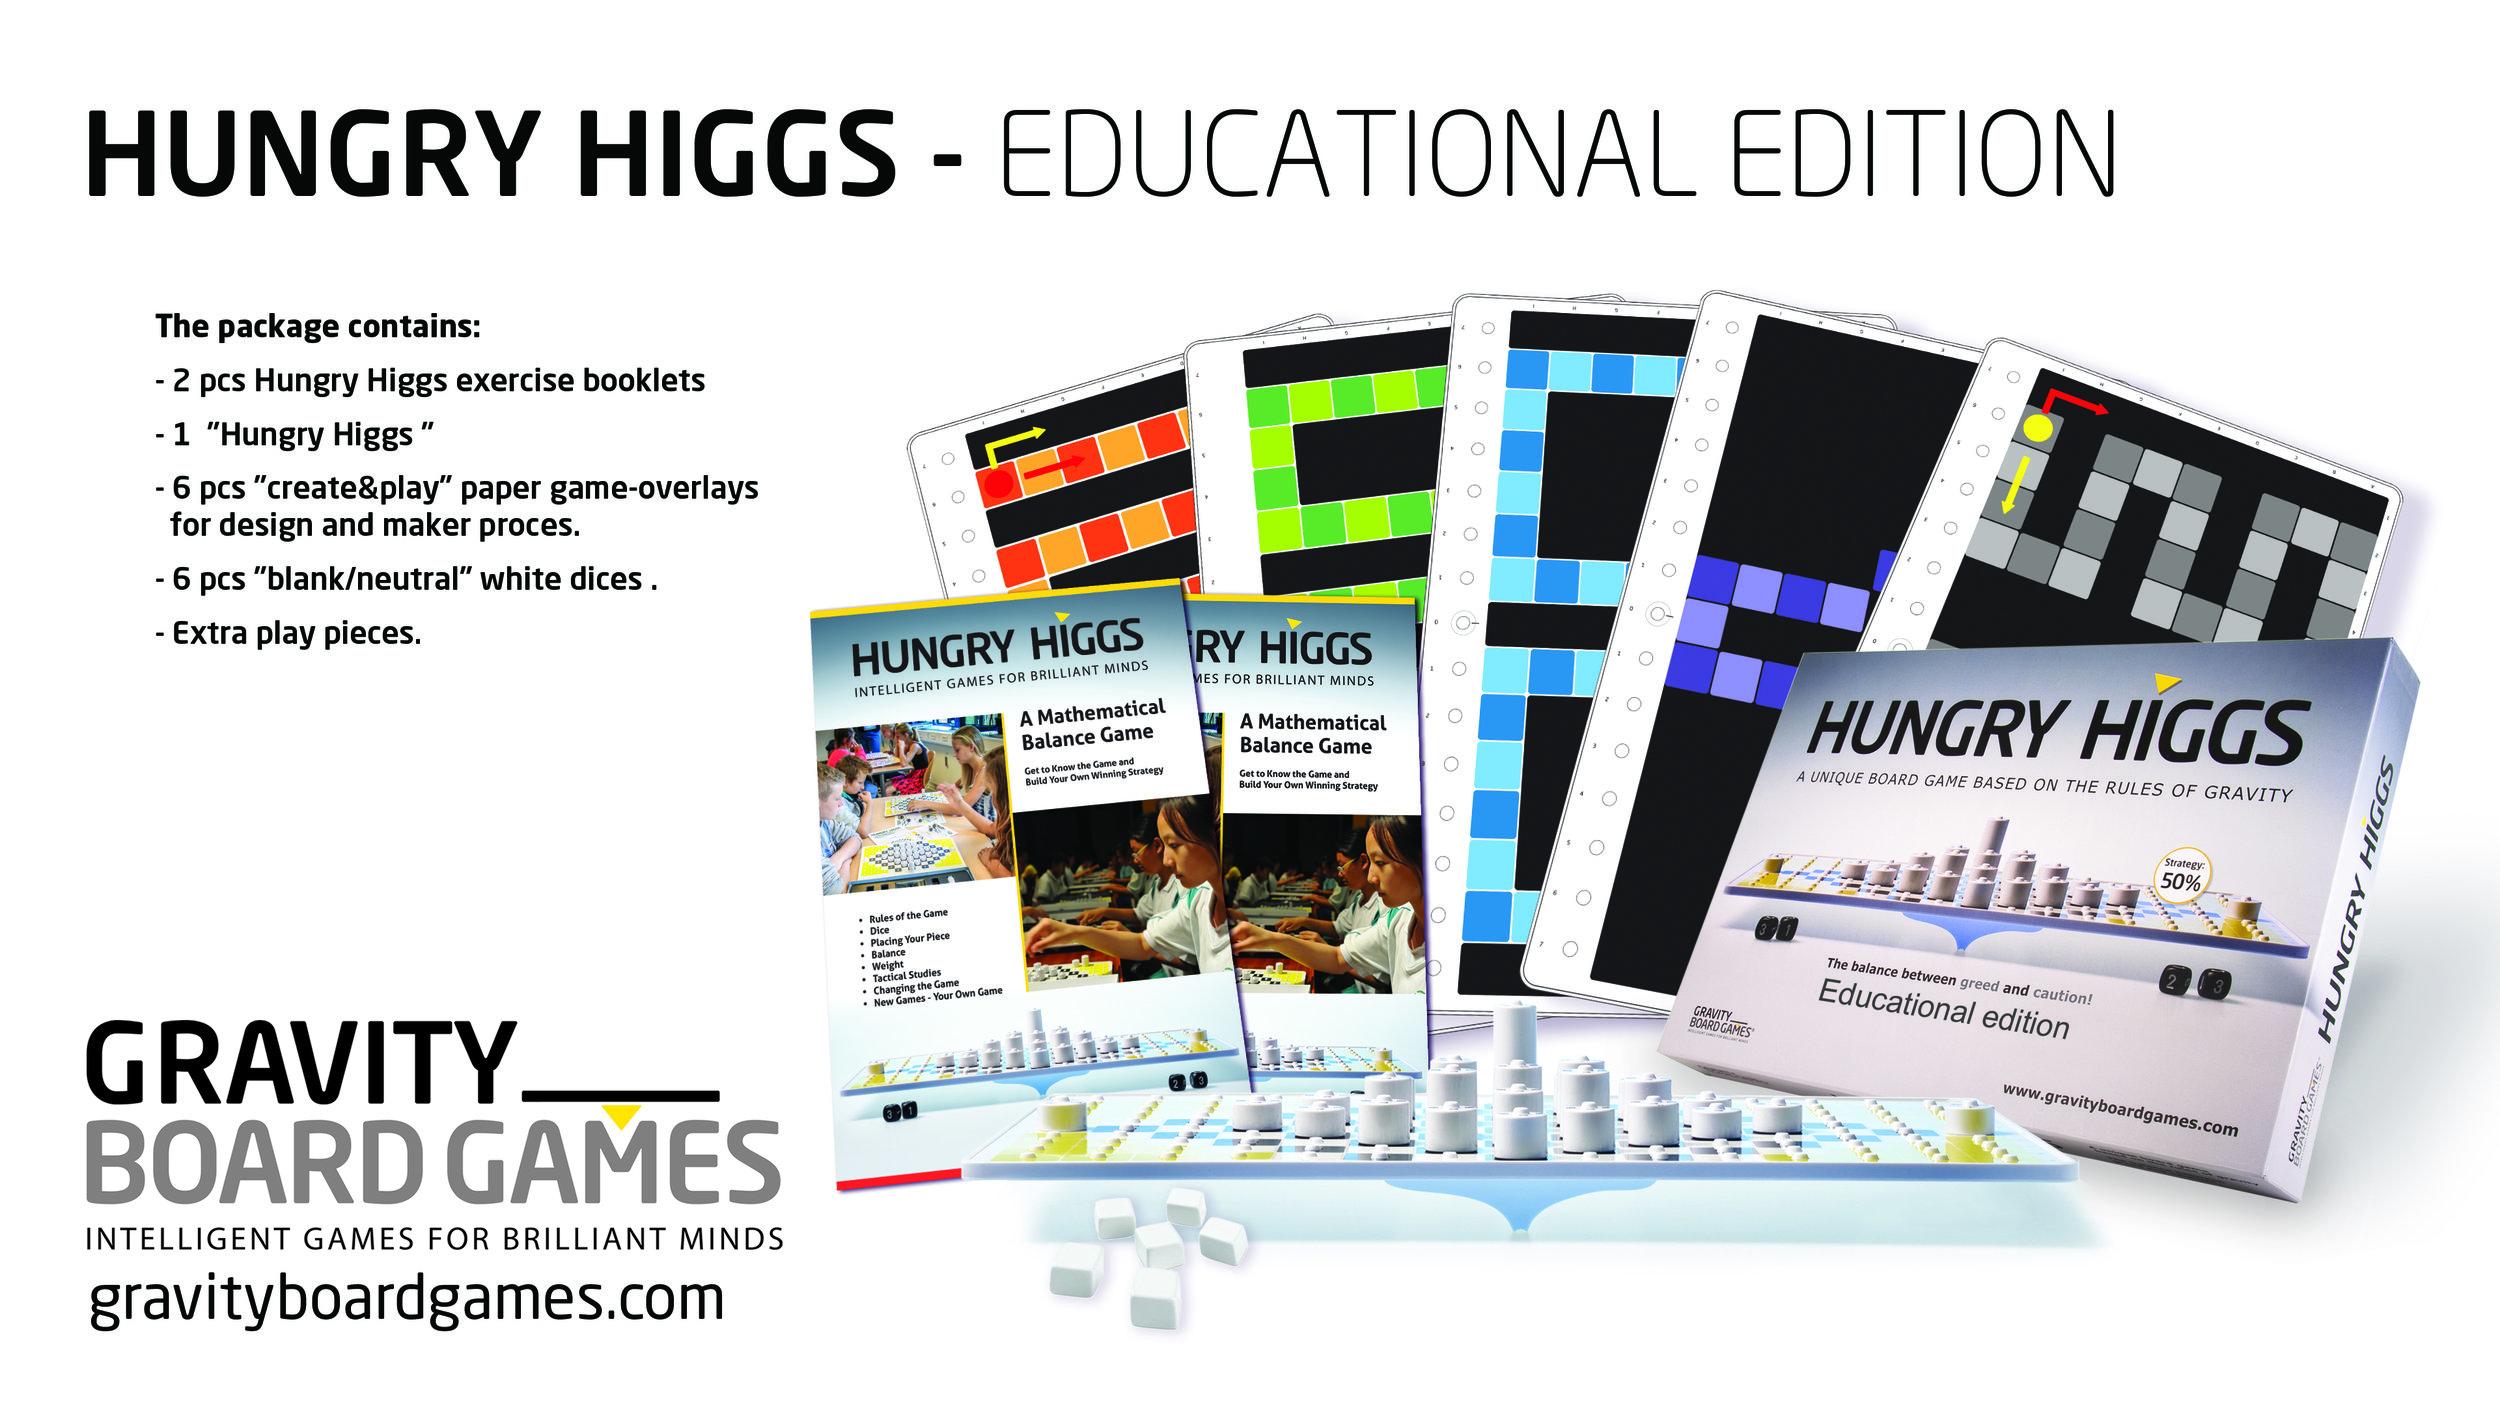 GravityBoardgames_HungryHiggs_EducationalEdition_V2.jpg